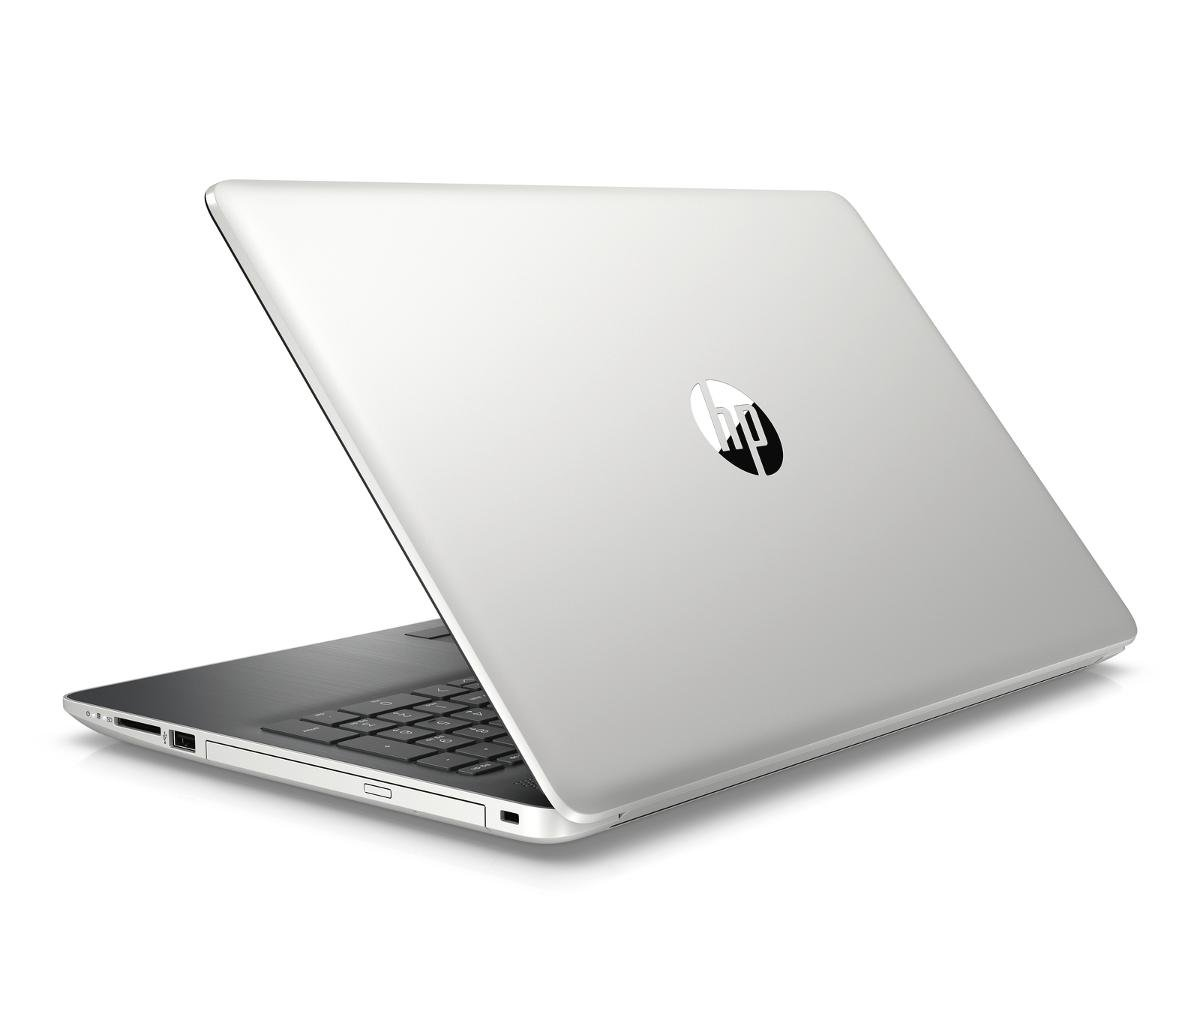 "Laptop HP 15-db0018nw 5GT66EA, Ryzen 5 2500U, 8 GB RAM, 15.6"", 256 GB, Windows 10 Home"